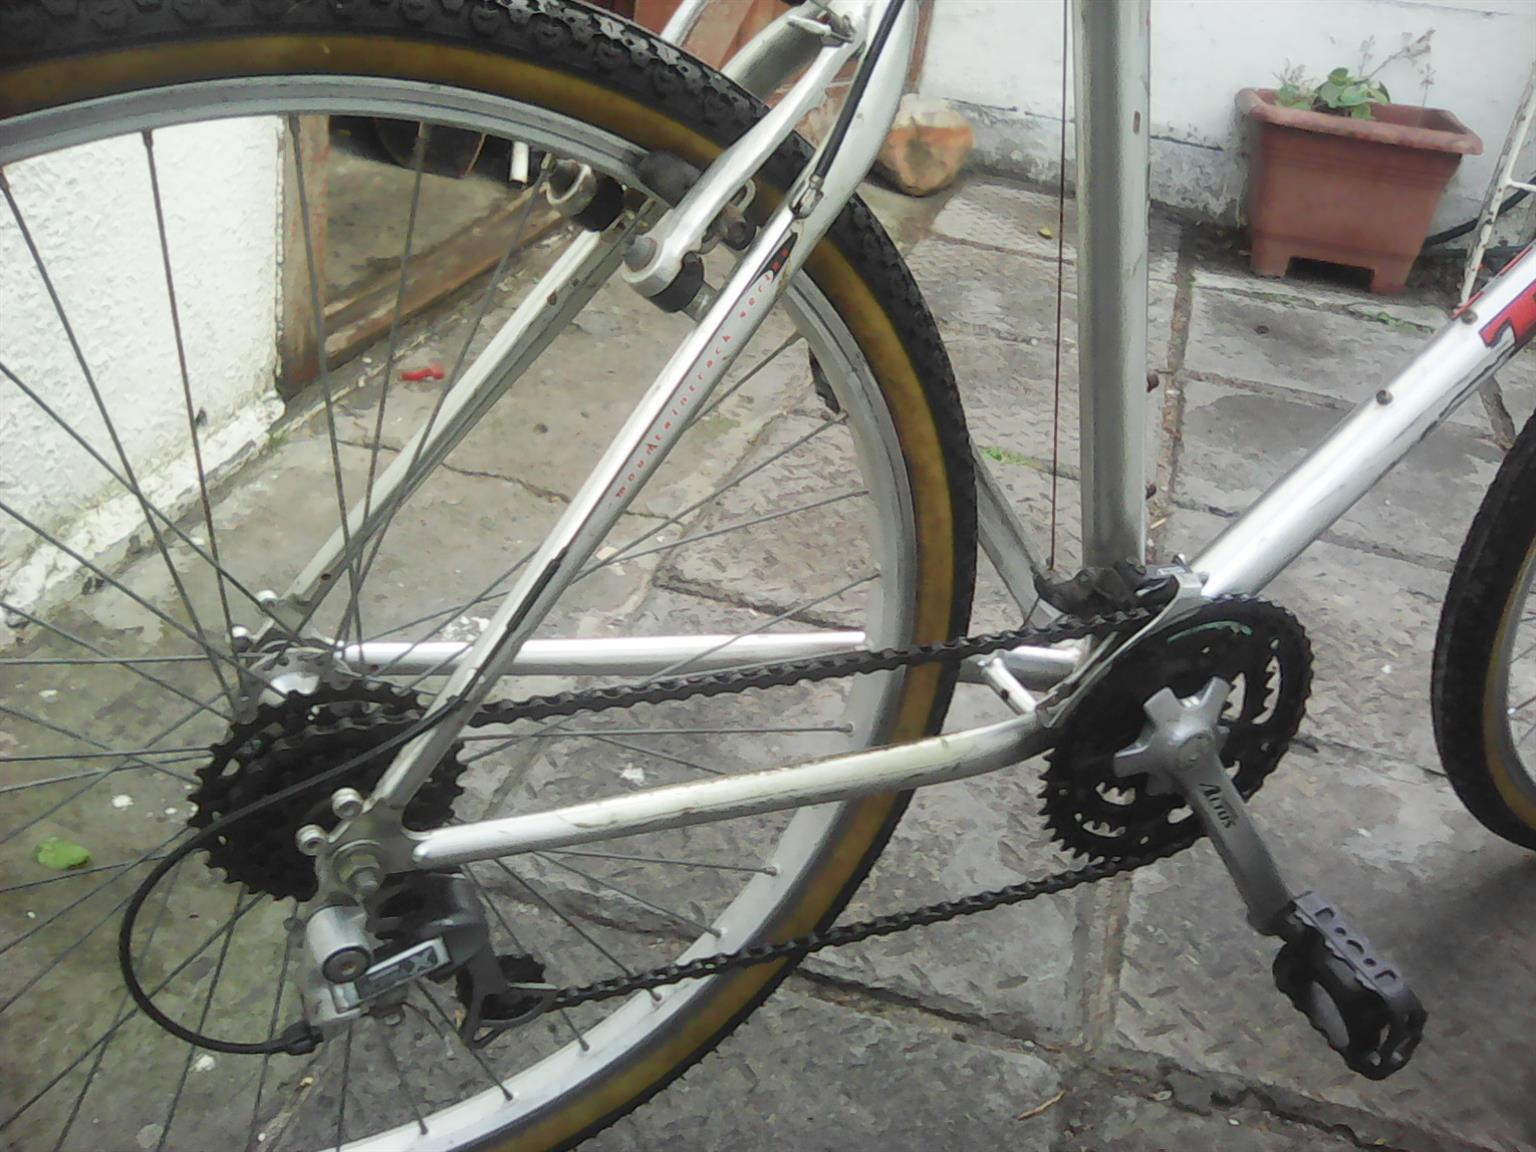 Preloved 53,5cm Trek mountainbike